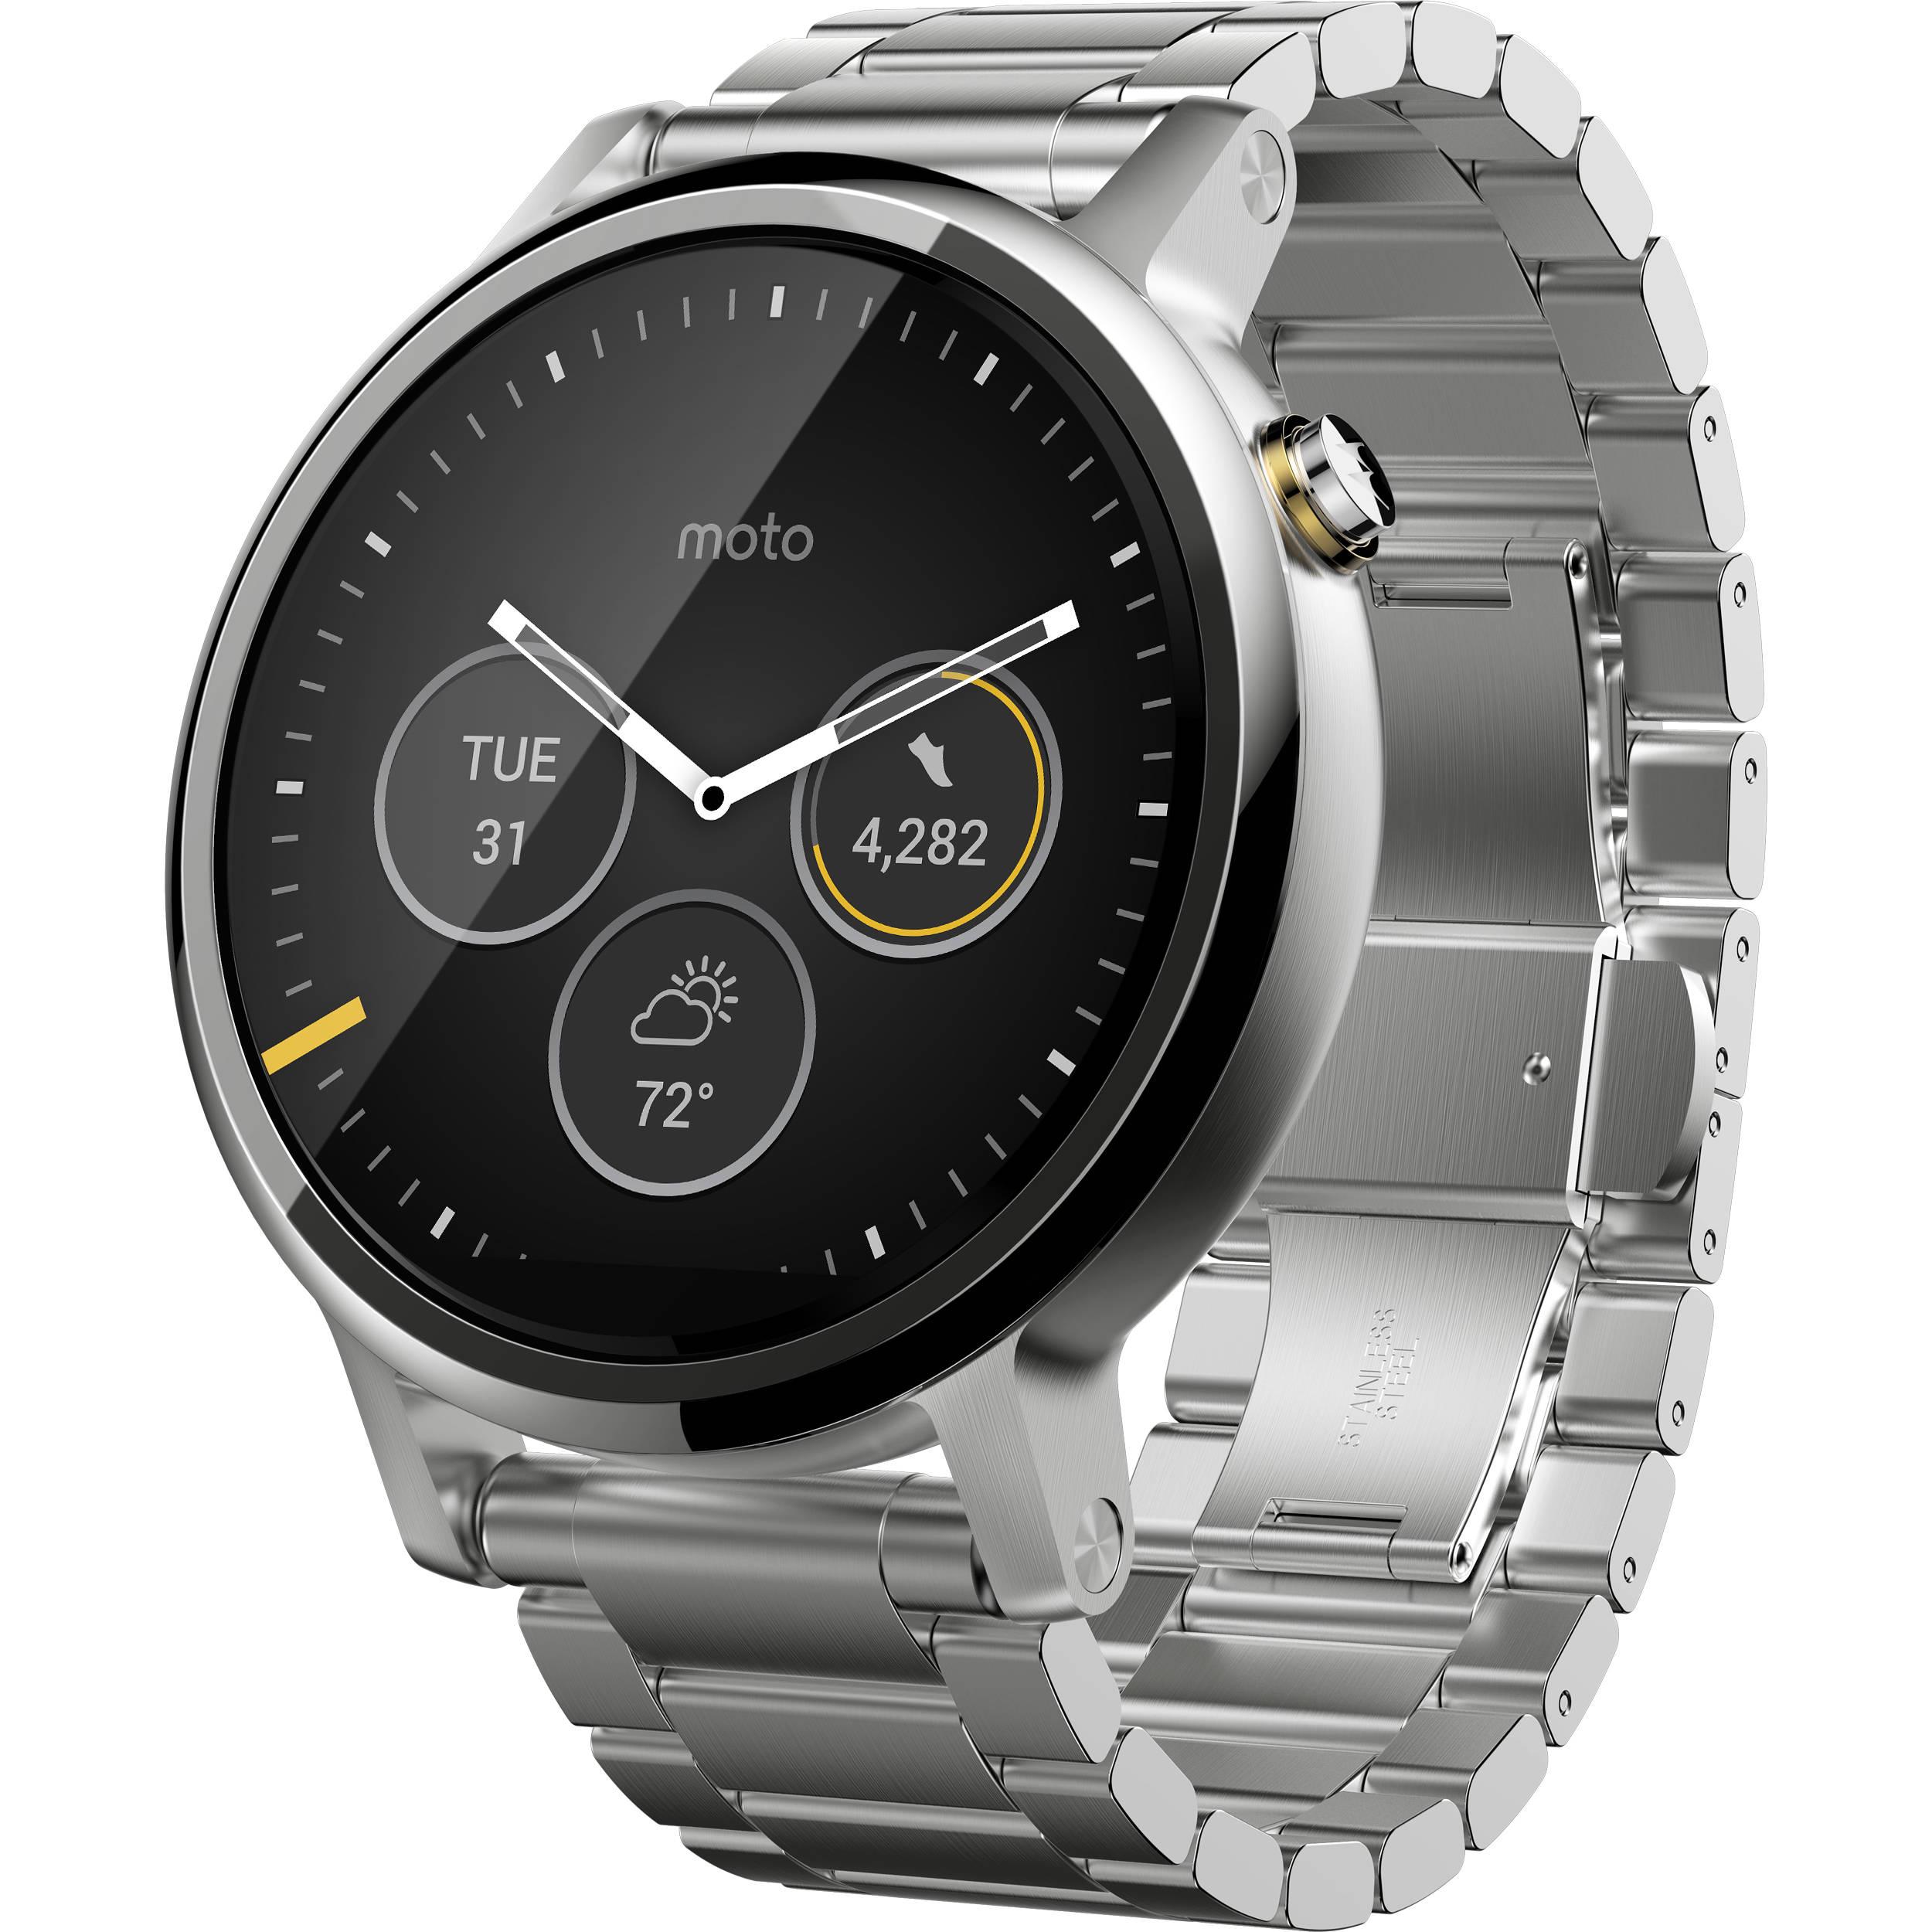 Used Moto 2nd Gen Moto 360 46mm Men's Smartwatch ...